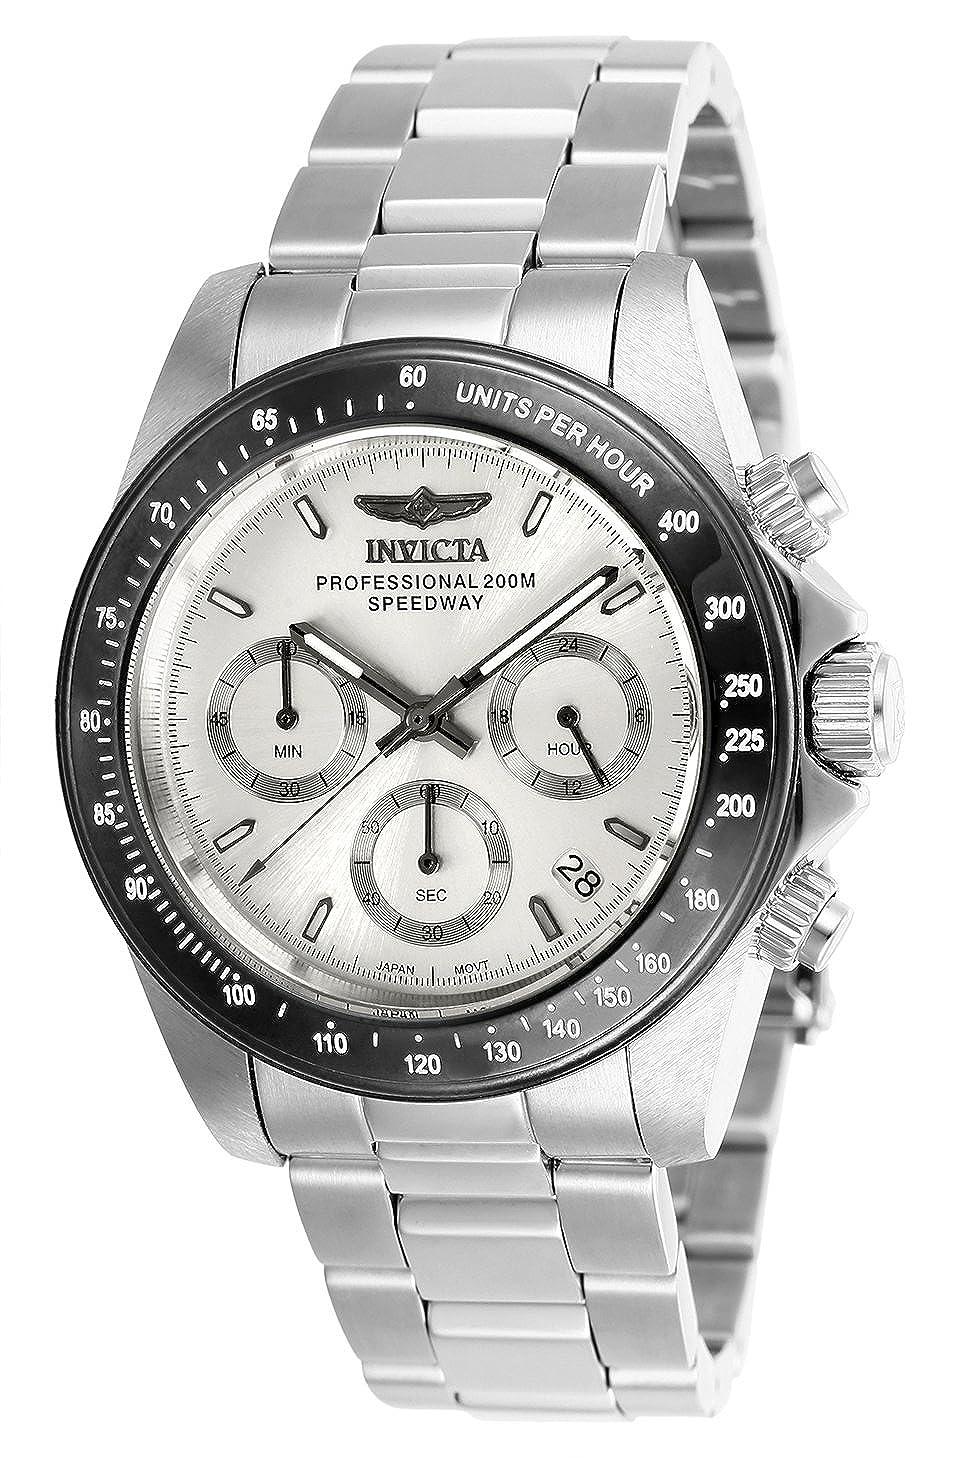 23cfaa25ed6 Invicta 26111 Speedway Unisex Wrist Watch Stainless Steel Quartz Silver  Dial  Amazon.co.uk  Watches